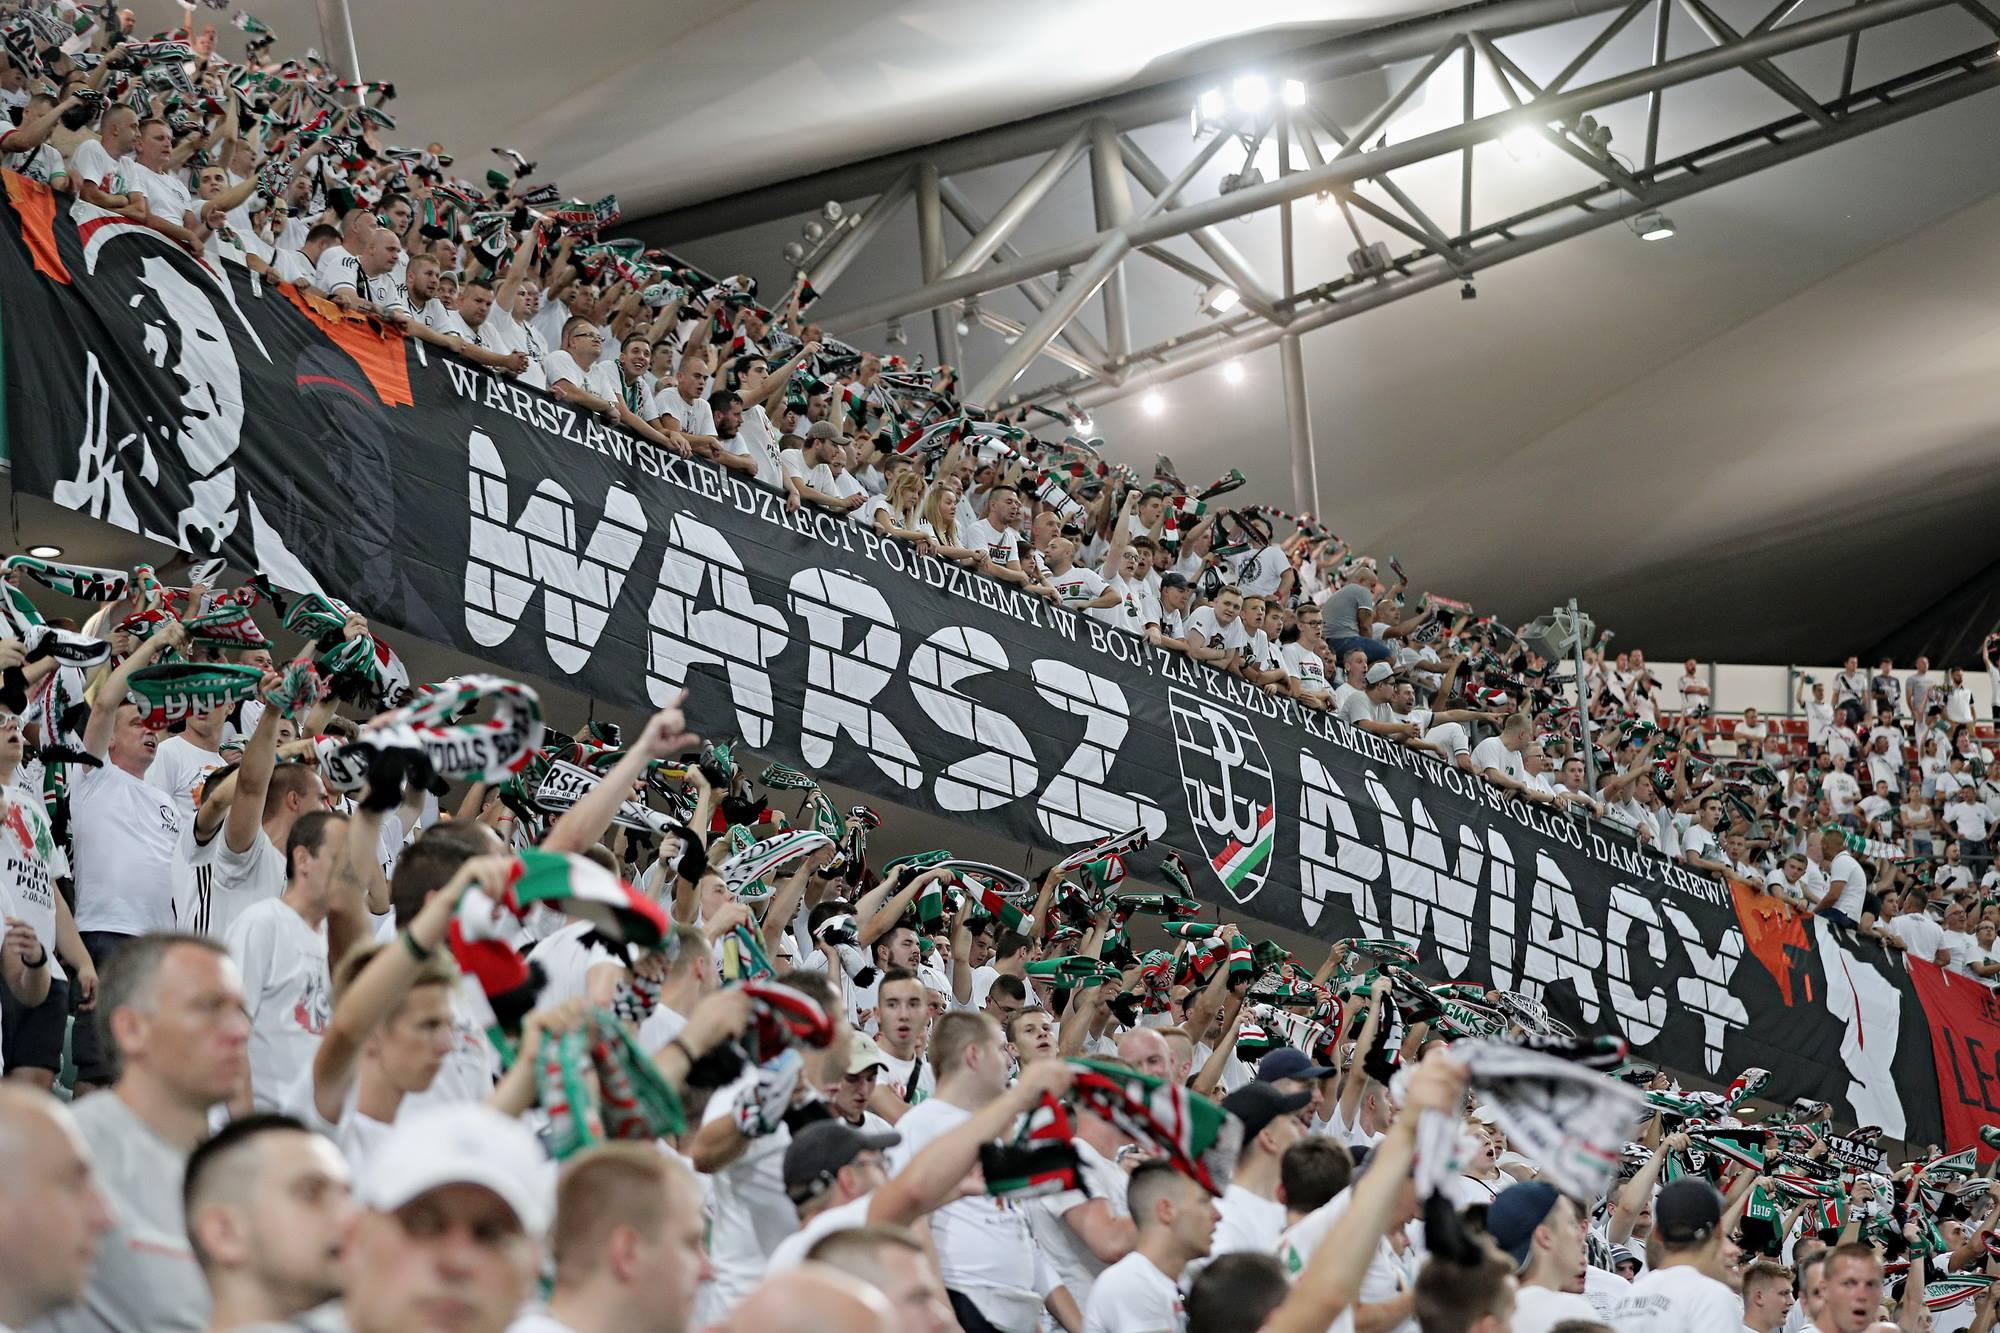 Ekstraklasa, ventitreesima giornata: big match in programma